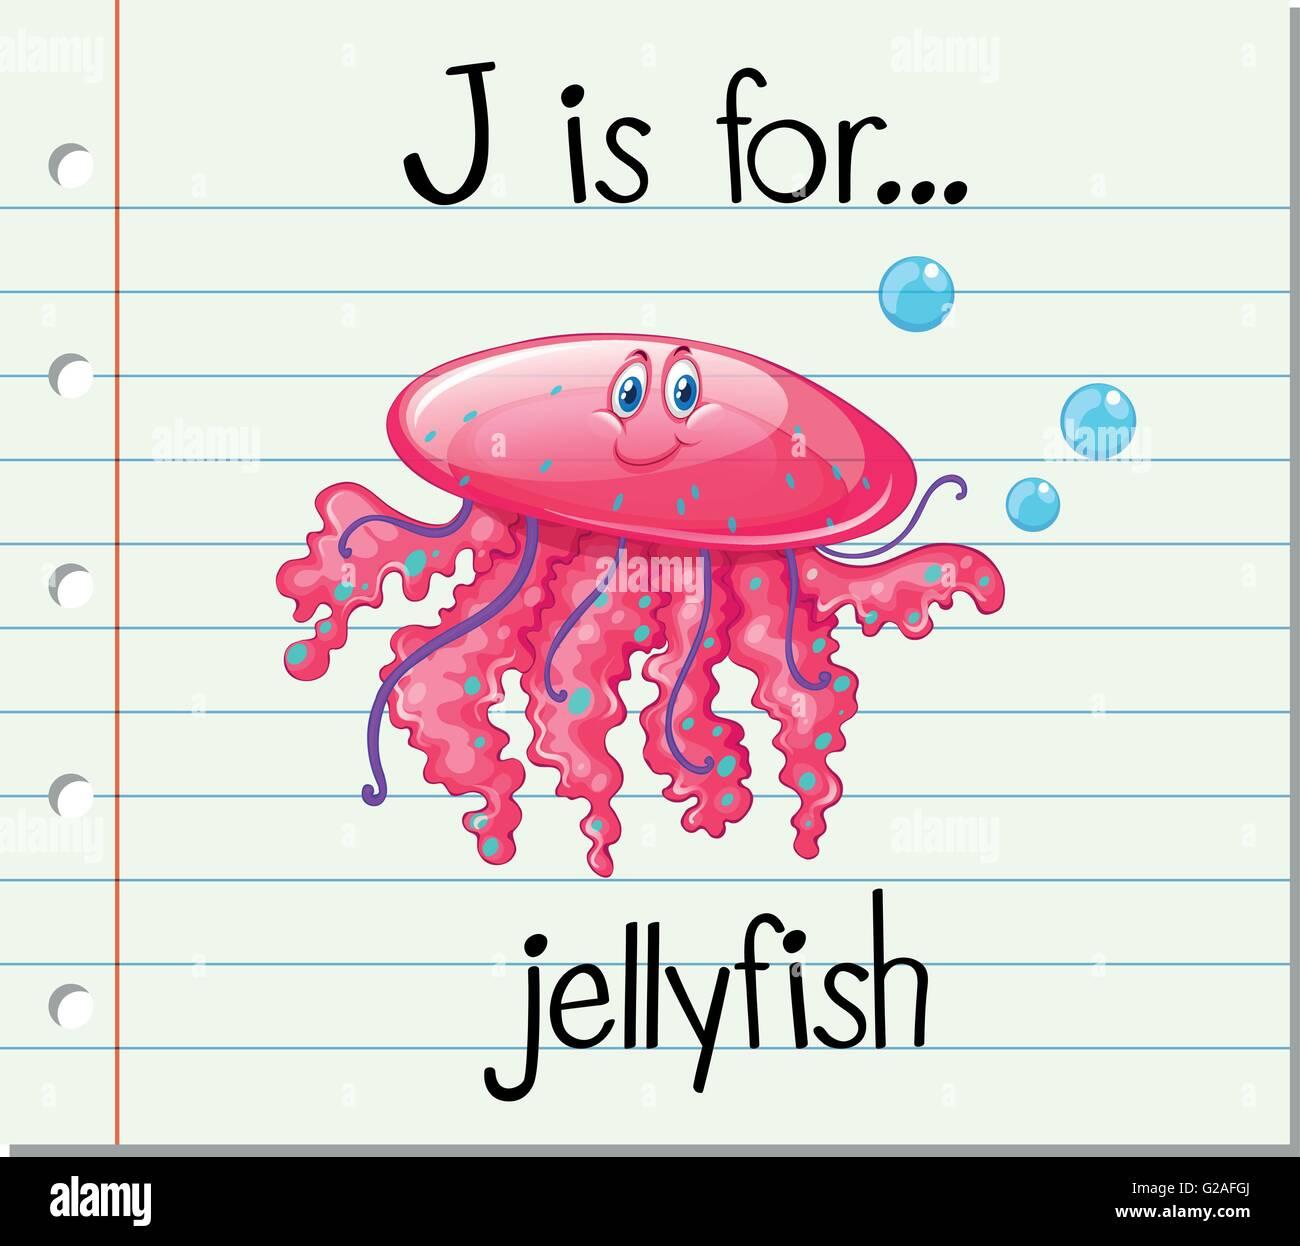 Letter J Jellyfish Stock Photos & Letter J Jellyfish Stock Images ...